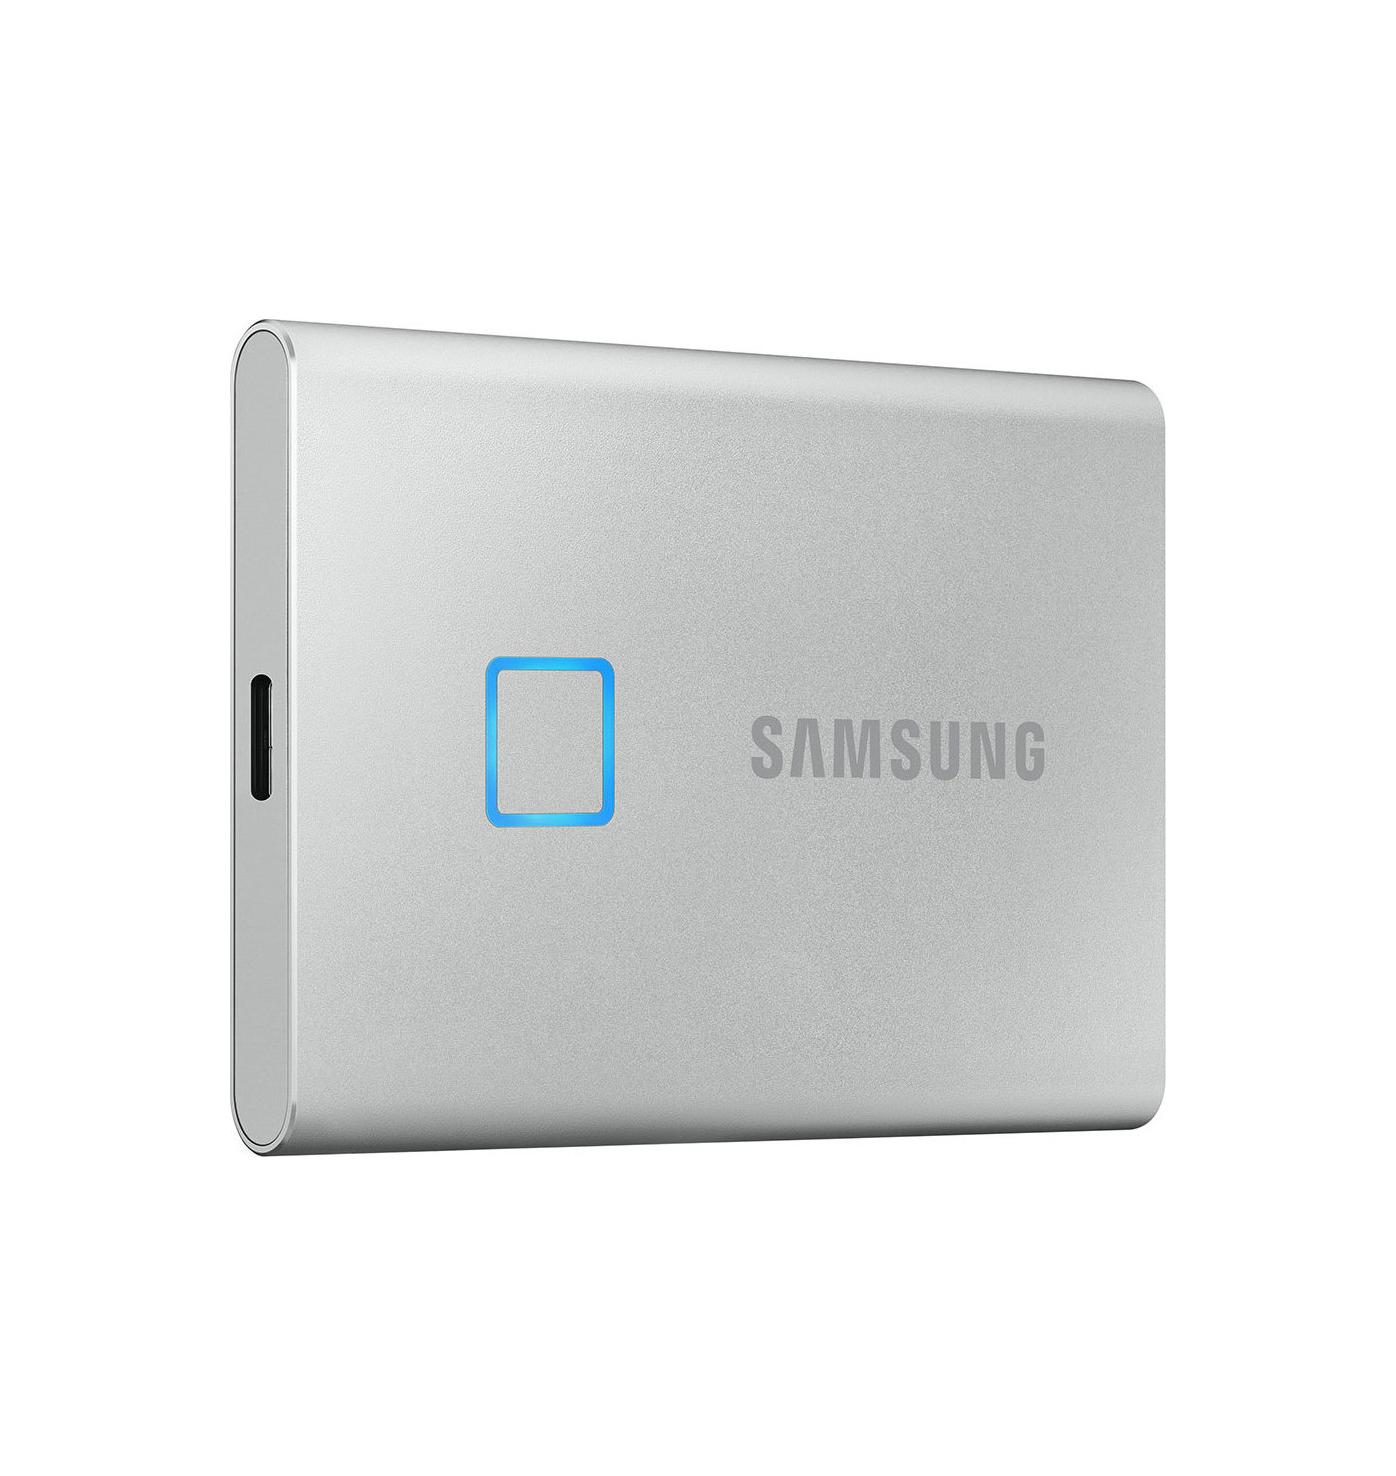 Samsung T7 Touch 500GB MU-PC500S/WW Εξωτερικός Σκληρός Δίσκος*  Silver